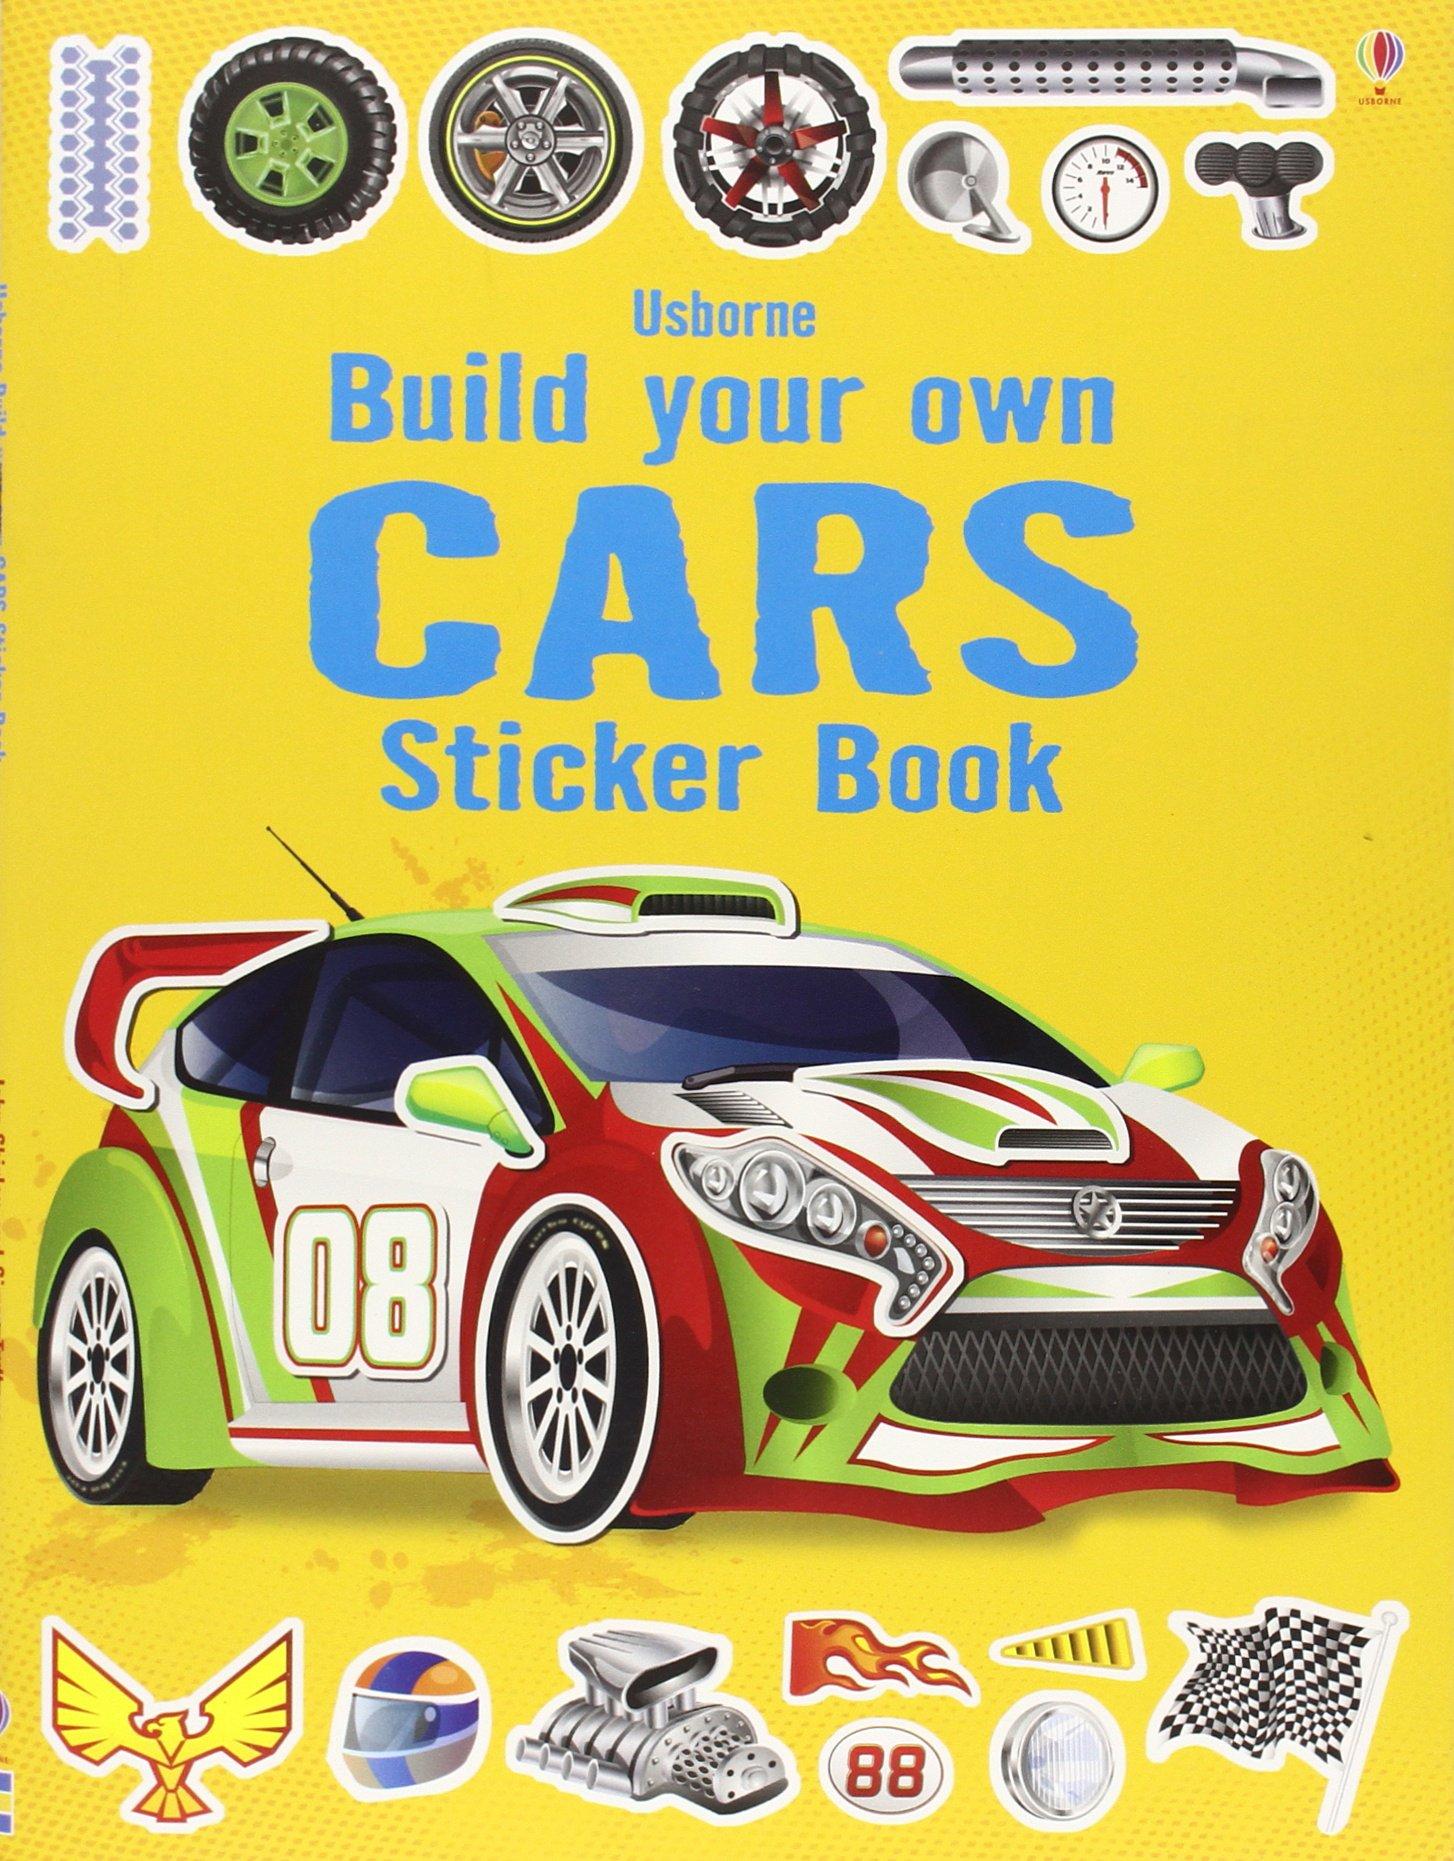 Design your car sticker - Build Your Own Cars Sticker Book Simon Tudhope 9781409555384 Amazon Com Books